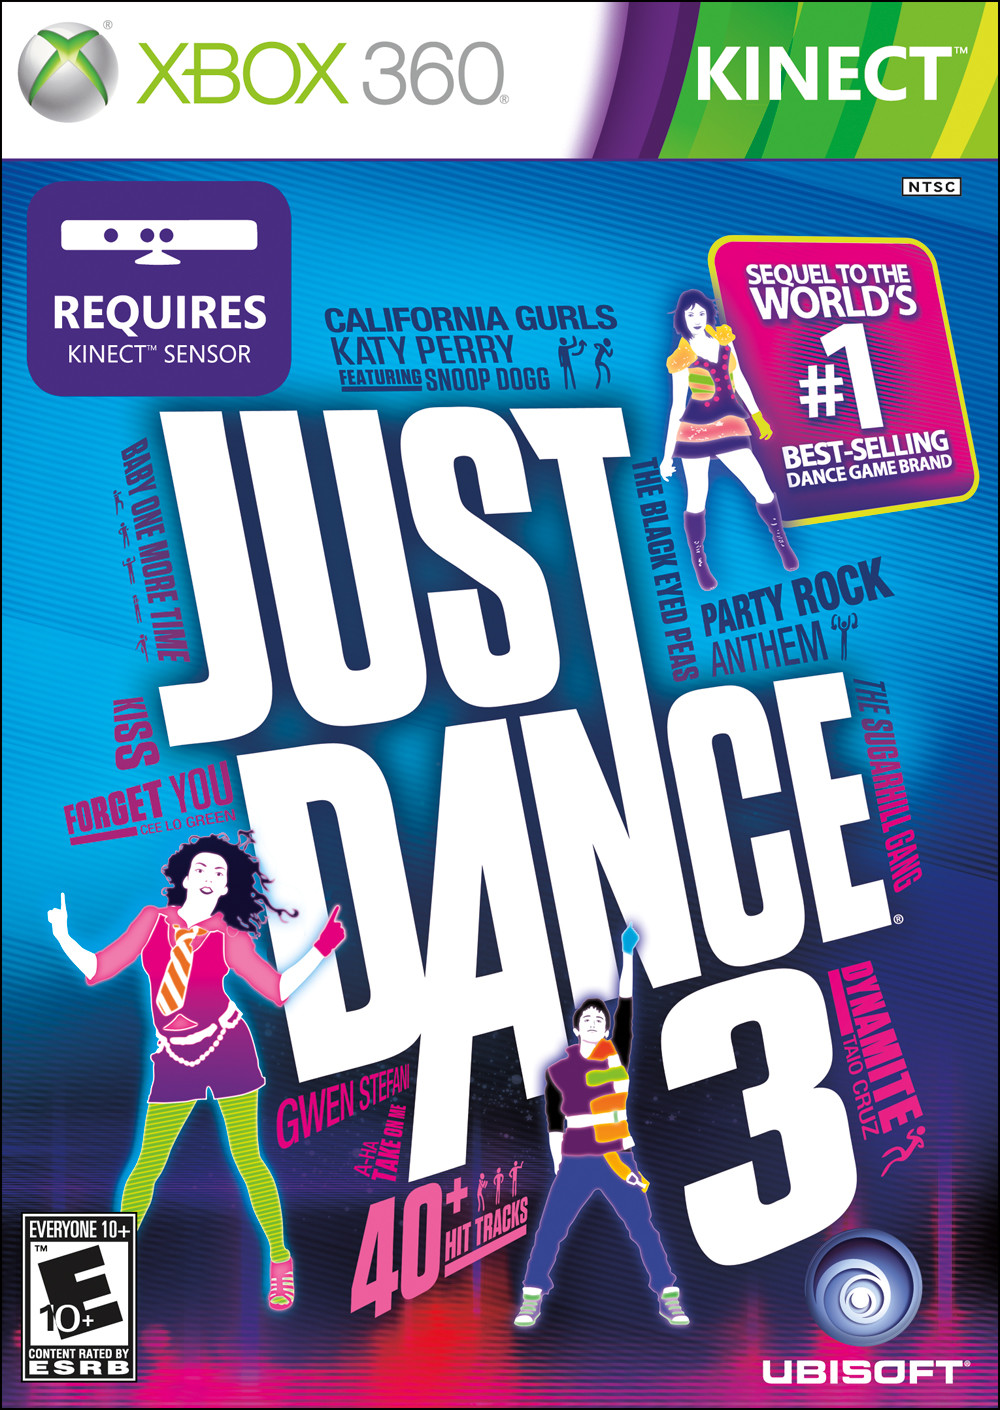 Just Dance 3 Xbox 360 [Kinect-DLC] İndir [MEGA] [JTAG-RGH